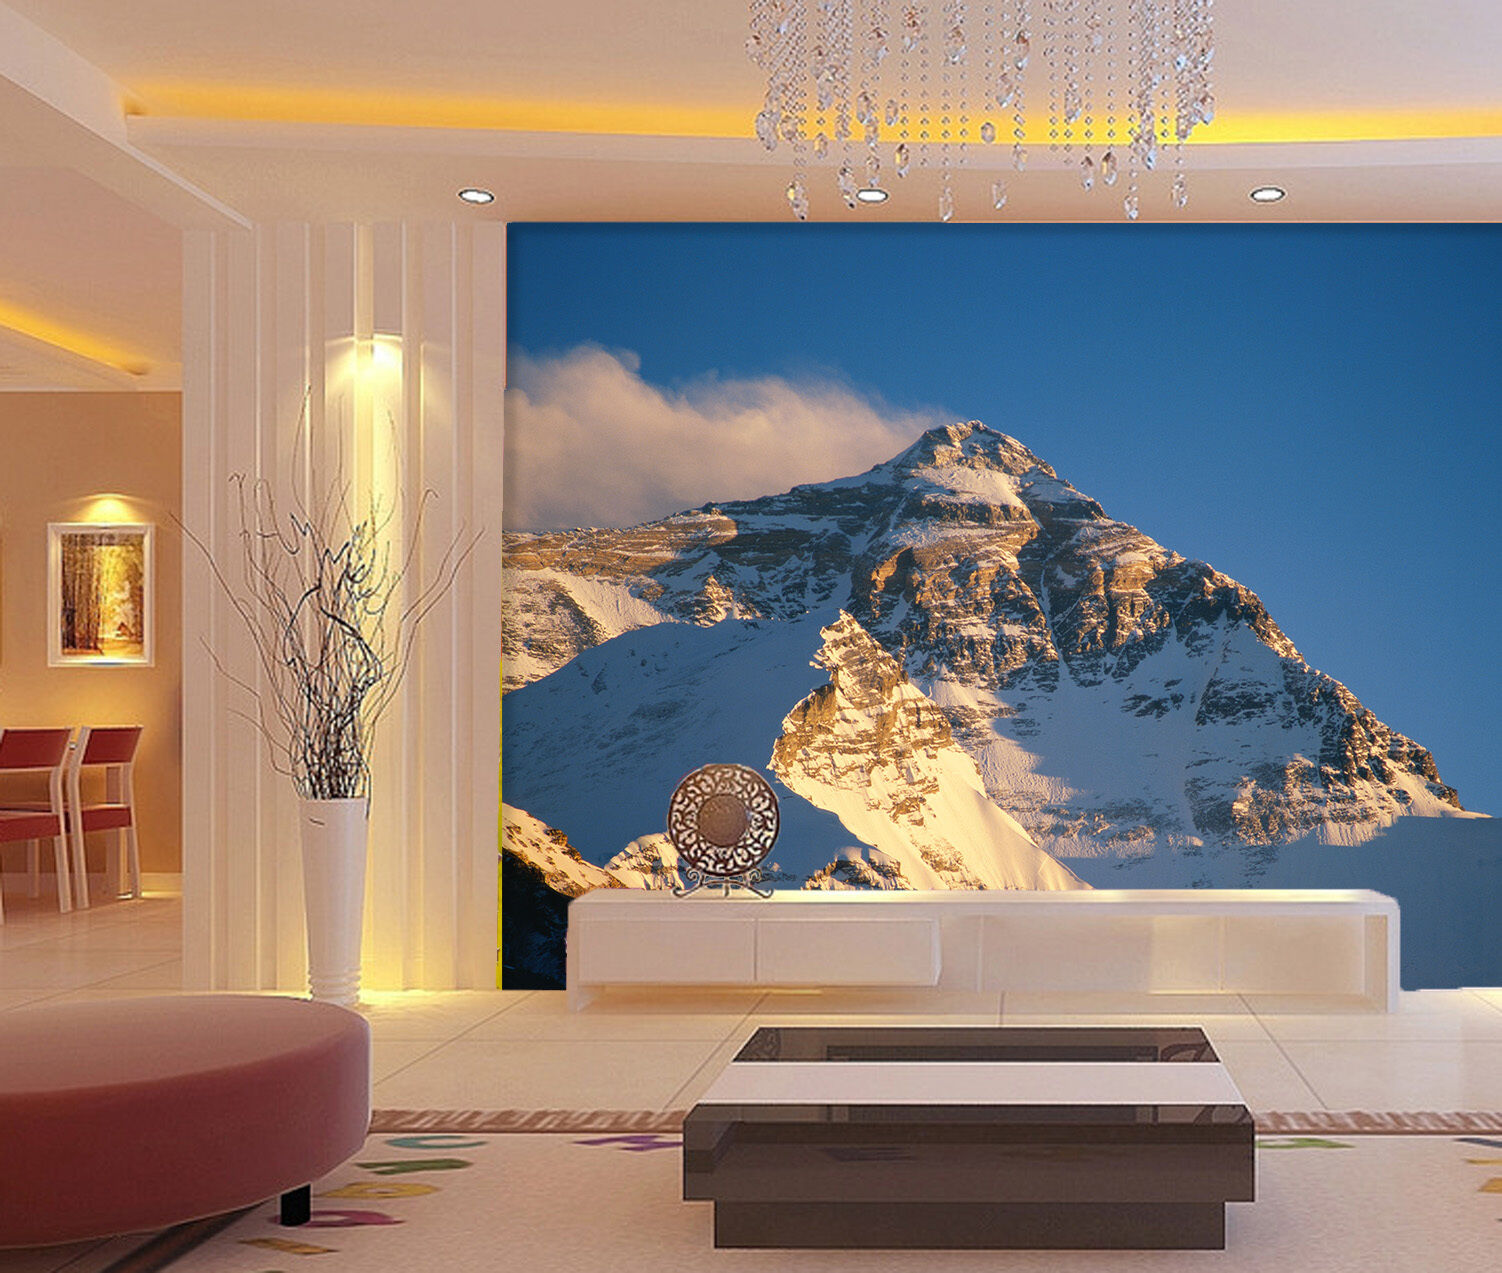 3D Der höchste Berg 875 Fototapeten Wandbild Fototapete BildTapete Familie